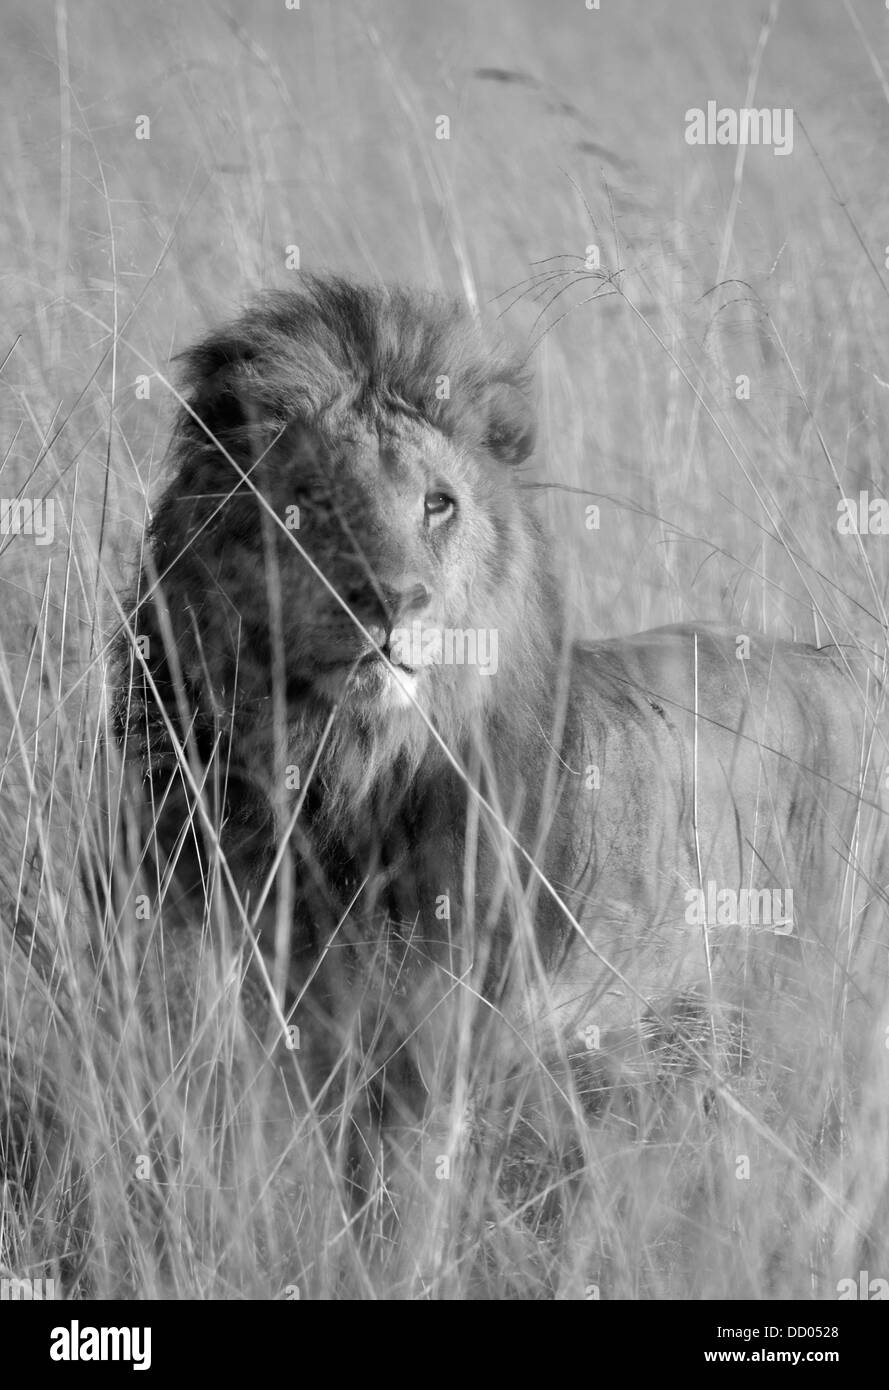 African Lion (Panthera leo) Male in long grass, Okavango Delta, Botswana, BLACK AND WHITE - Stock Image